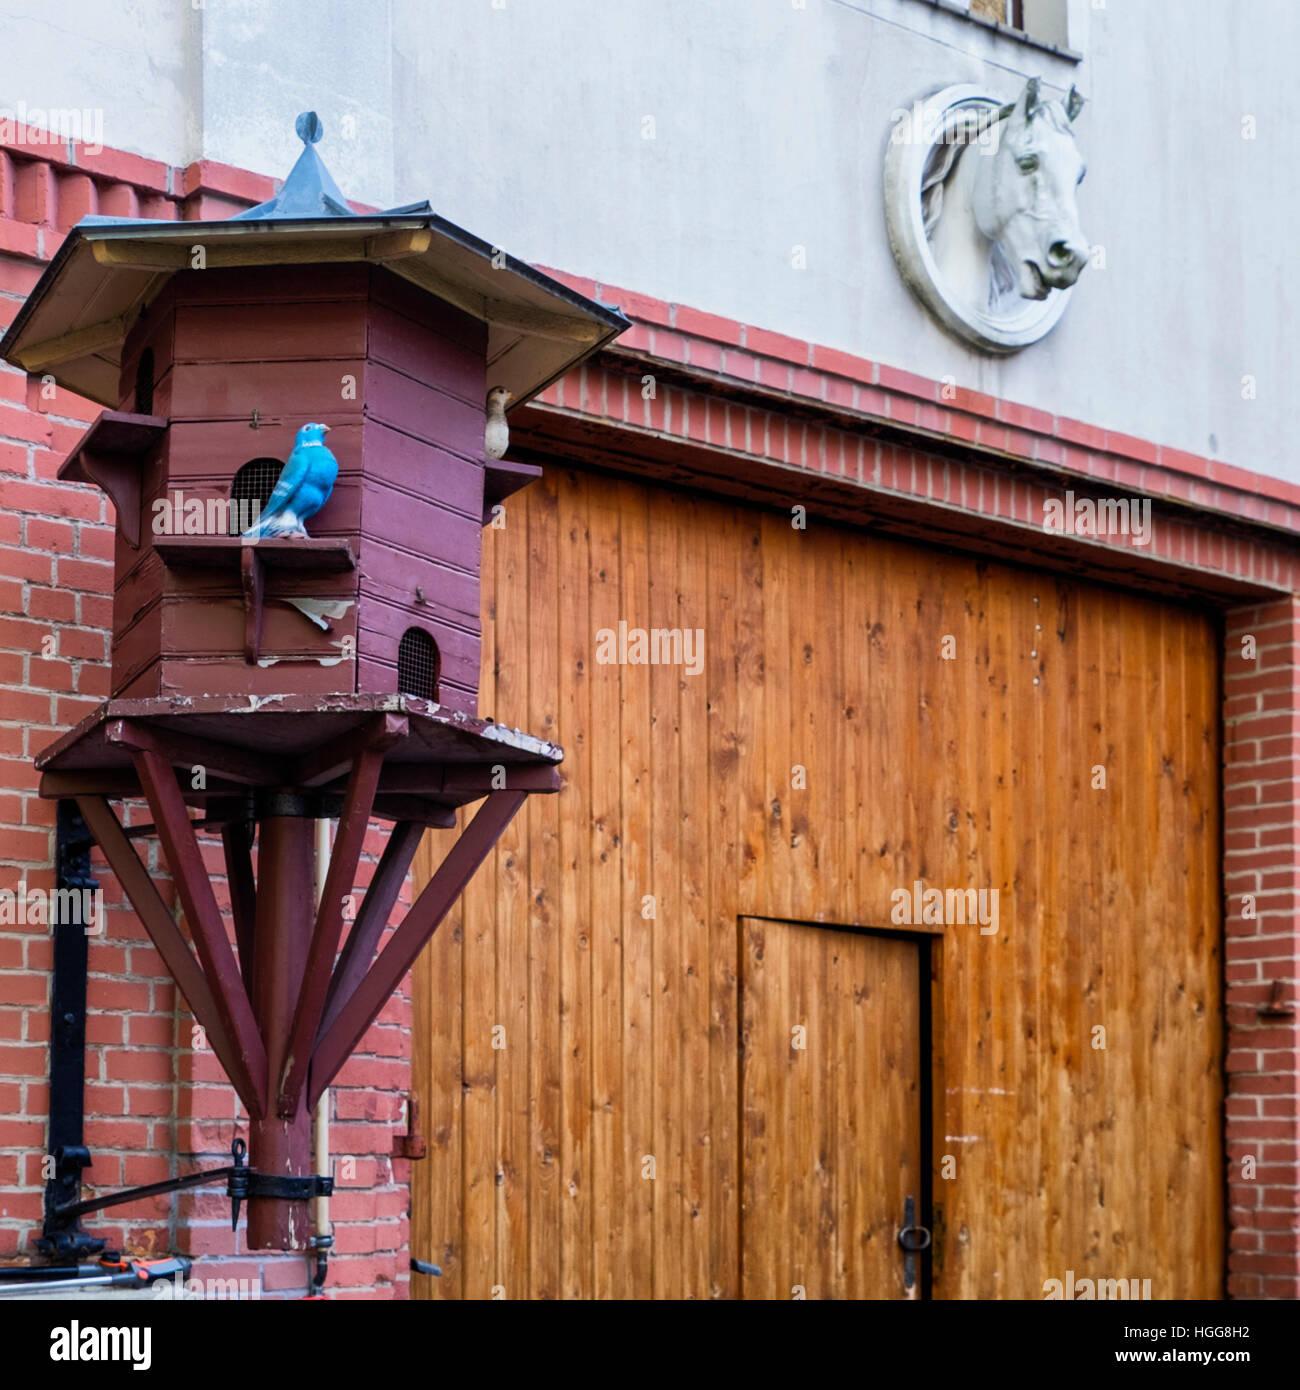 Berlin,Neukölln. Bird nesting box and artificial birds at stables in Rixdorf historic Bohemian Village - Stock Image